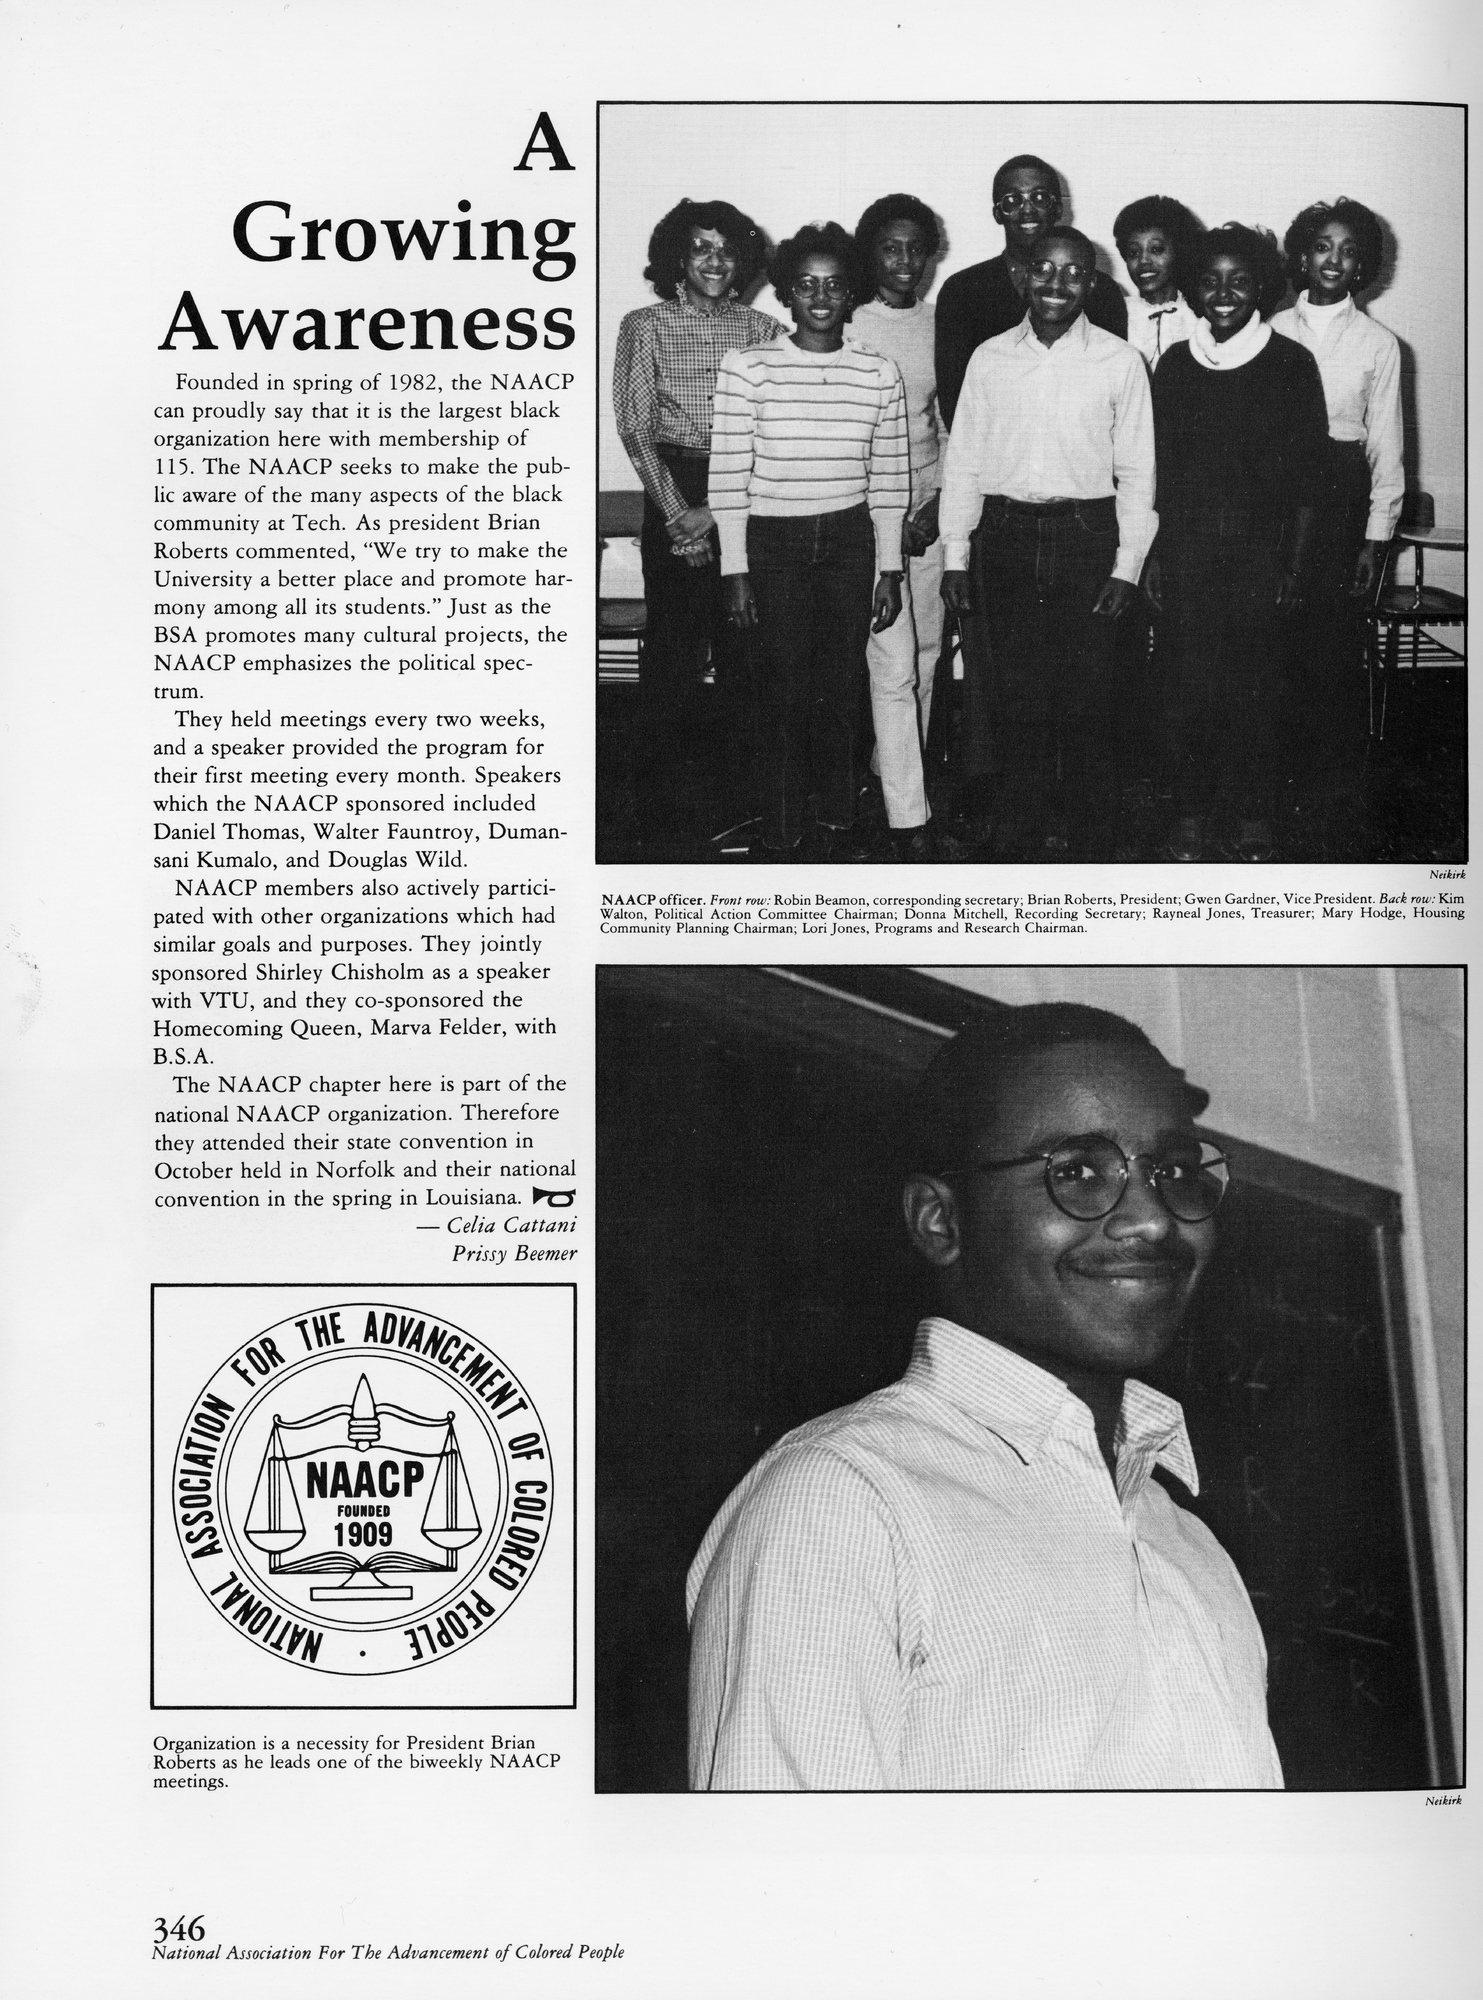 http://spec.lib.vt.edu/pickup/Omeka_upload/NAACP_1983Bugle_pg346.jpg